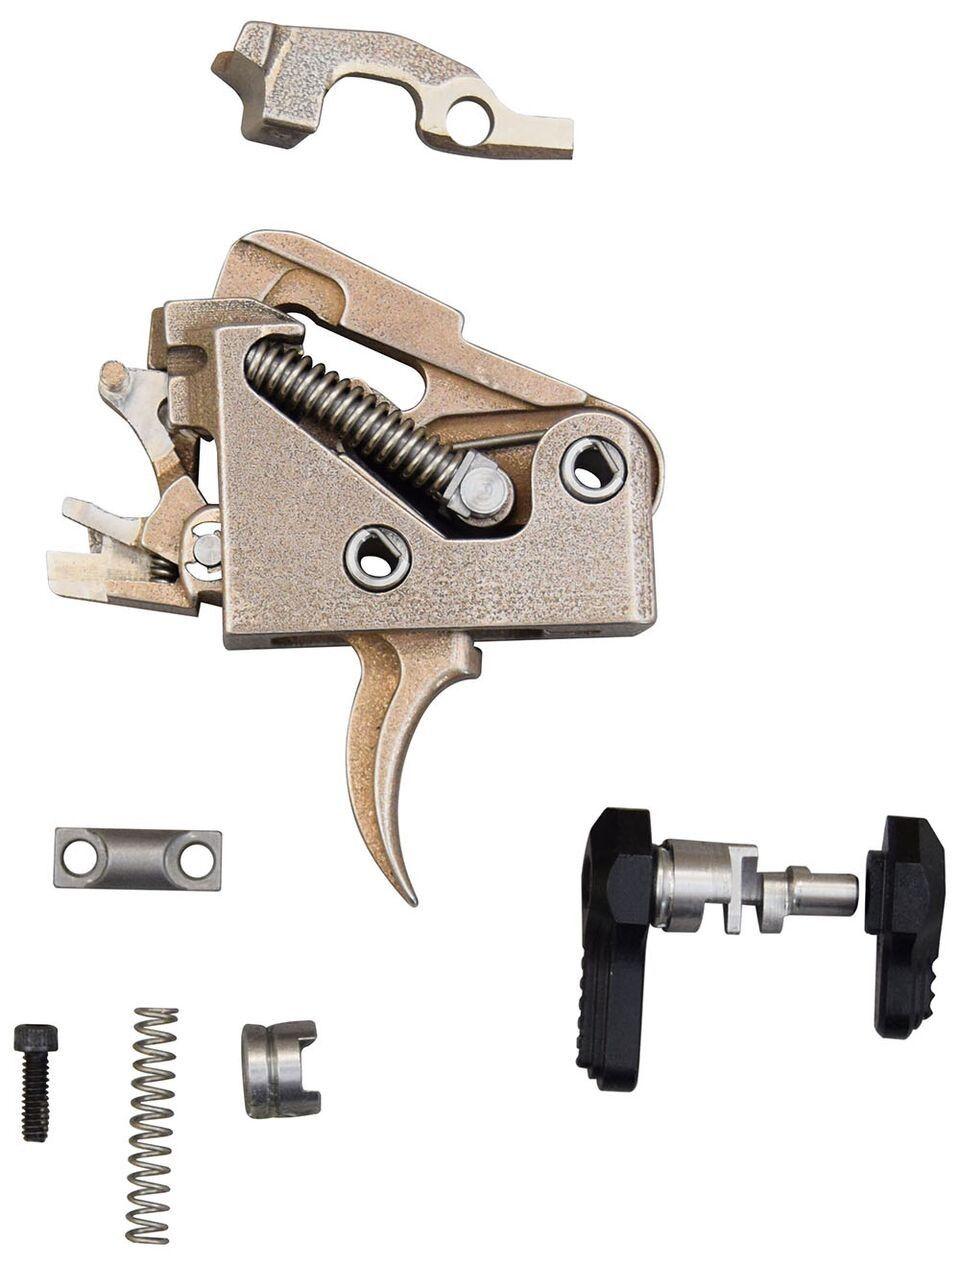 Fostech Echo Trigger - Gen II - Patented Fast Fire Trigger